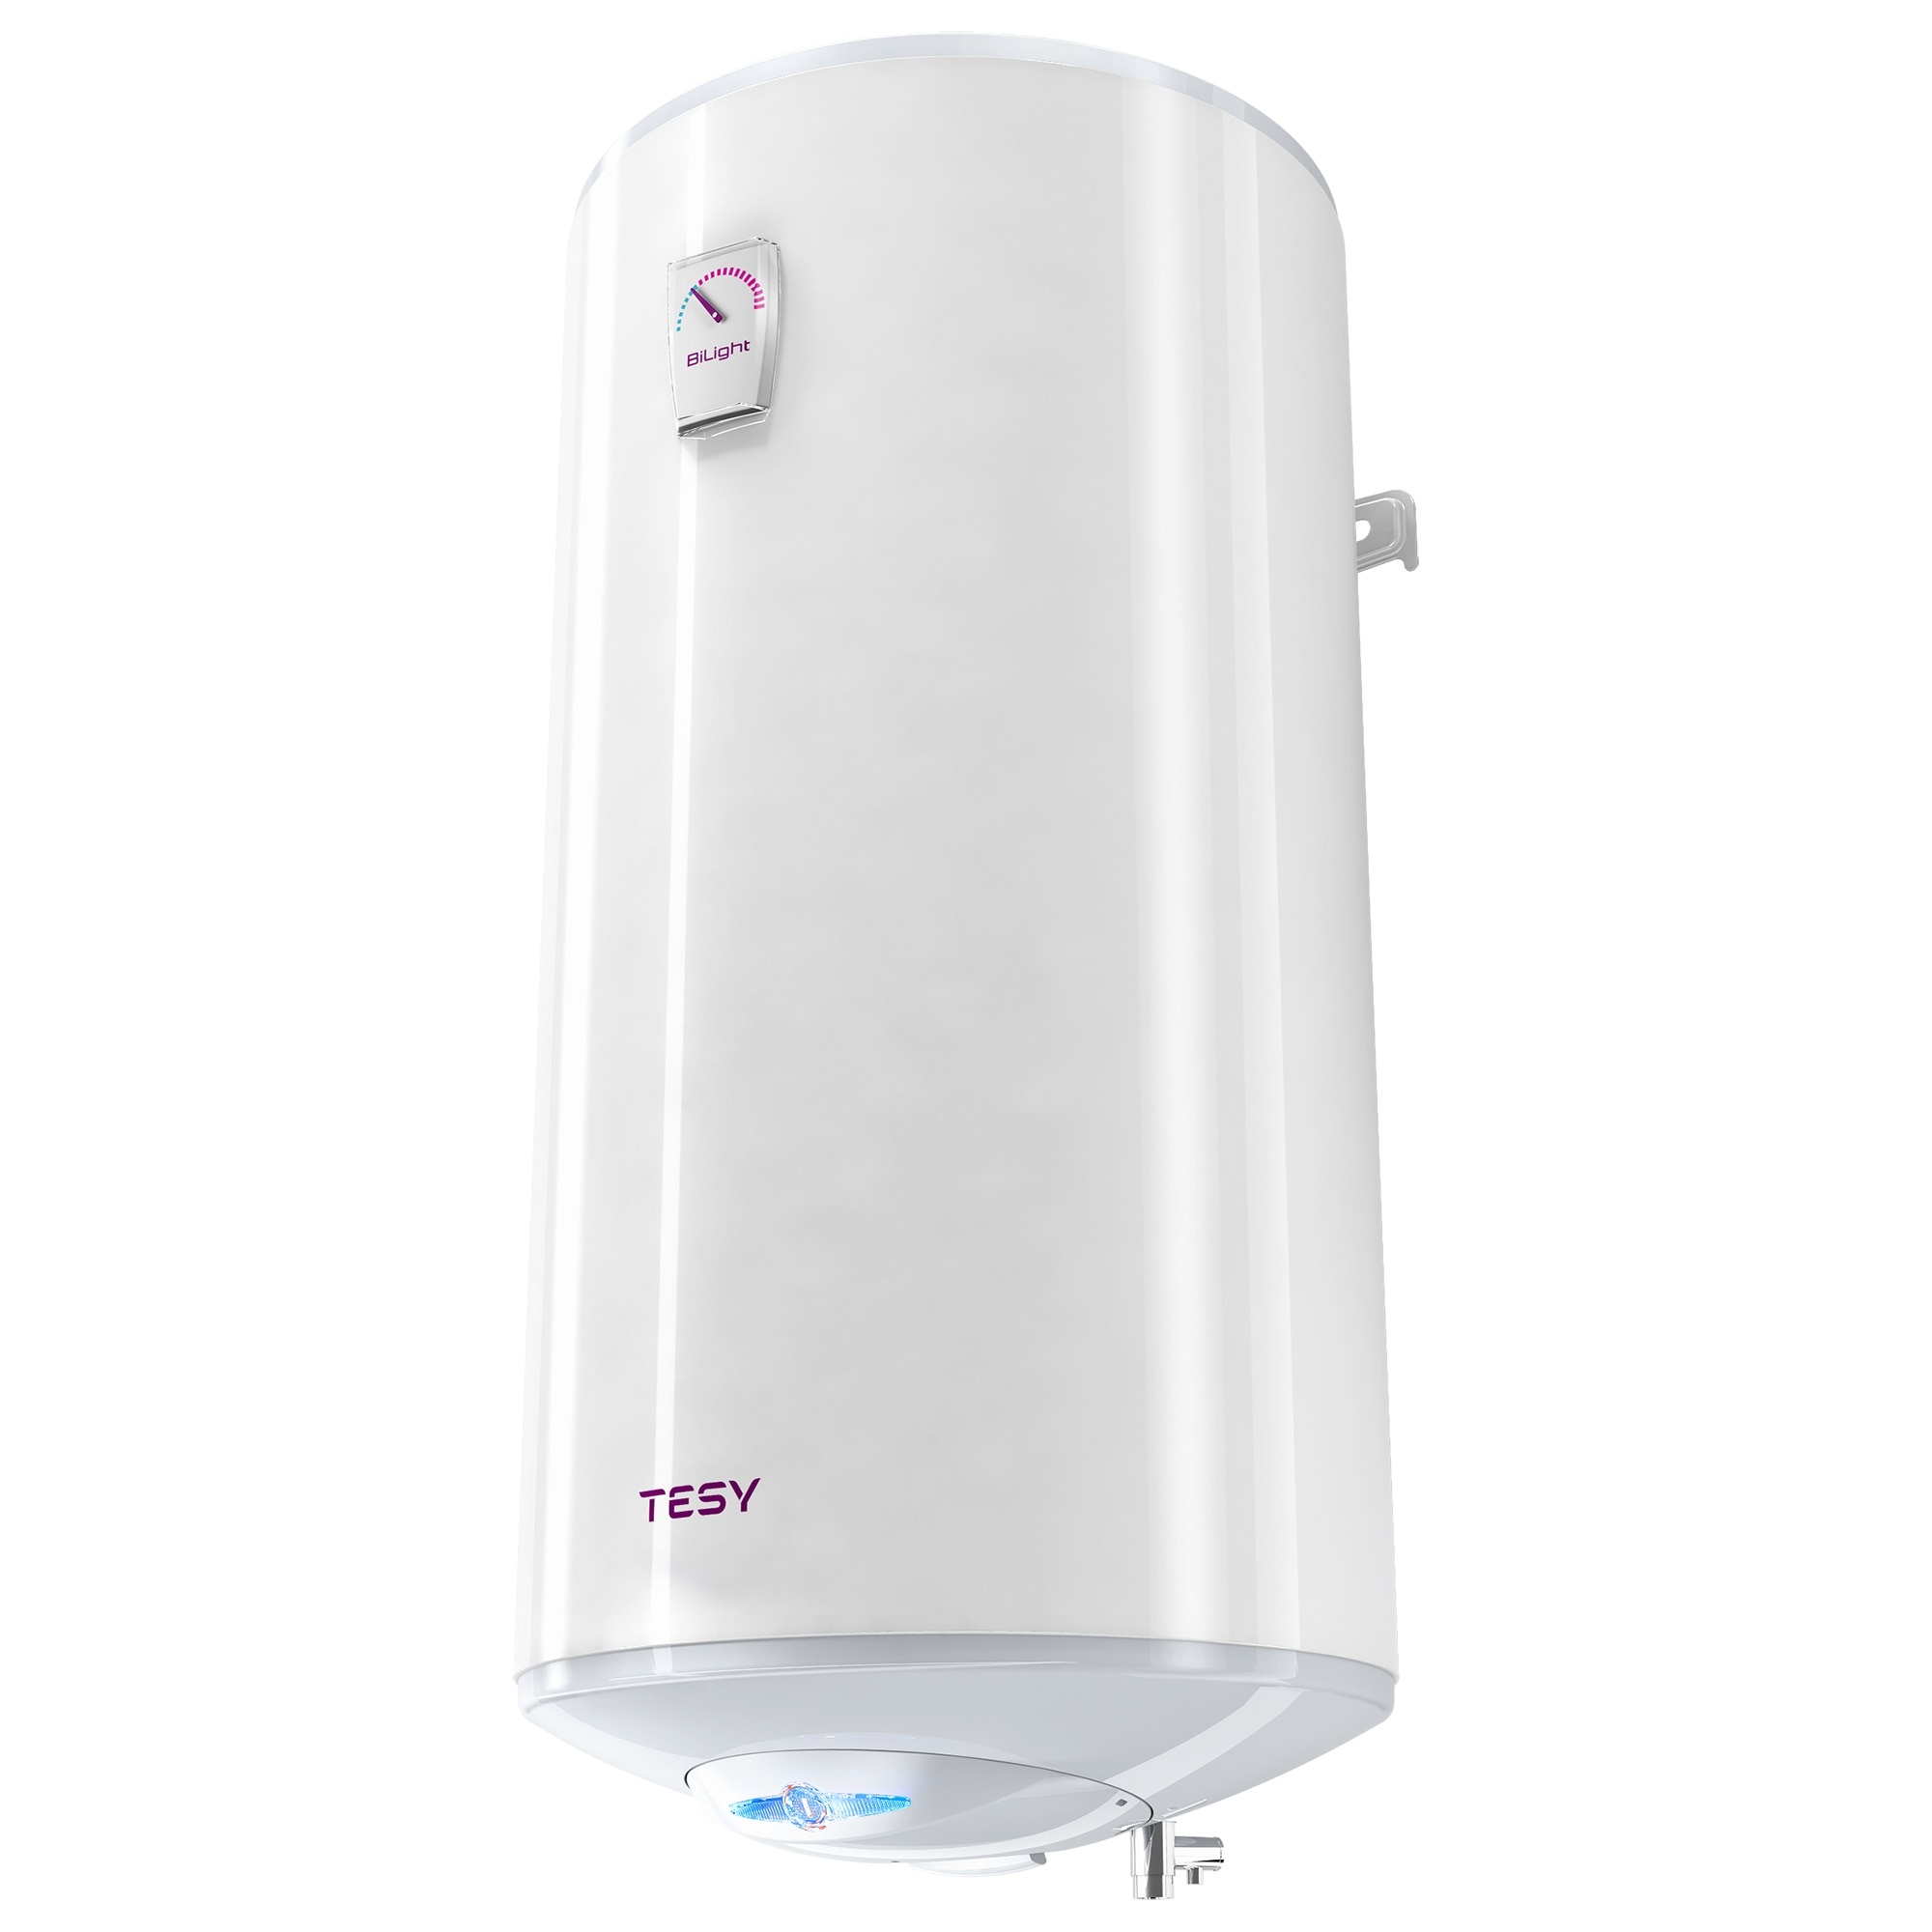 Fotografie Boiler electric Tesy BiLight GCV804420B11TSR, 2000 W, 80 l, 0.8 Mpa, 18 mm, Protectie anti-inghet